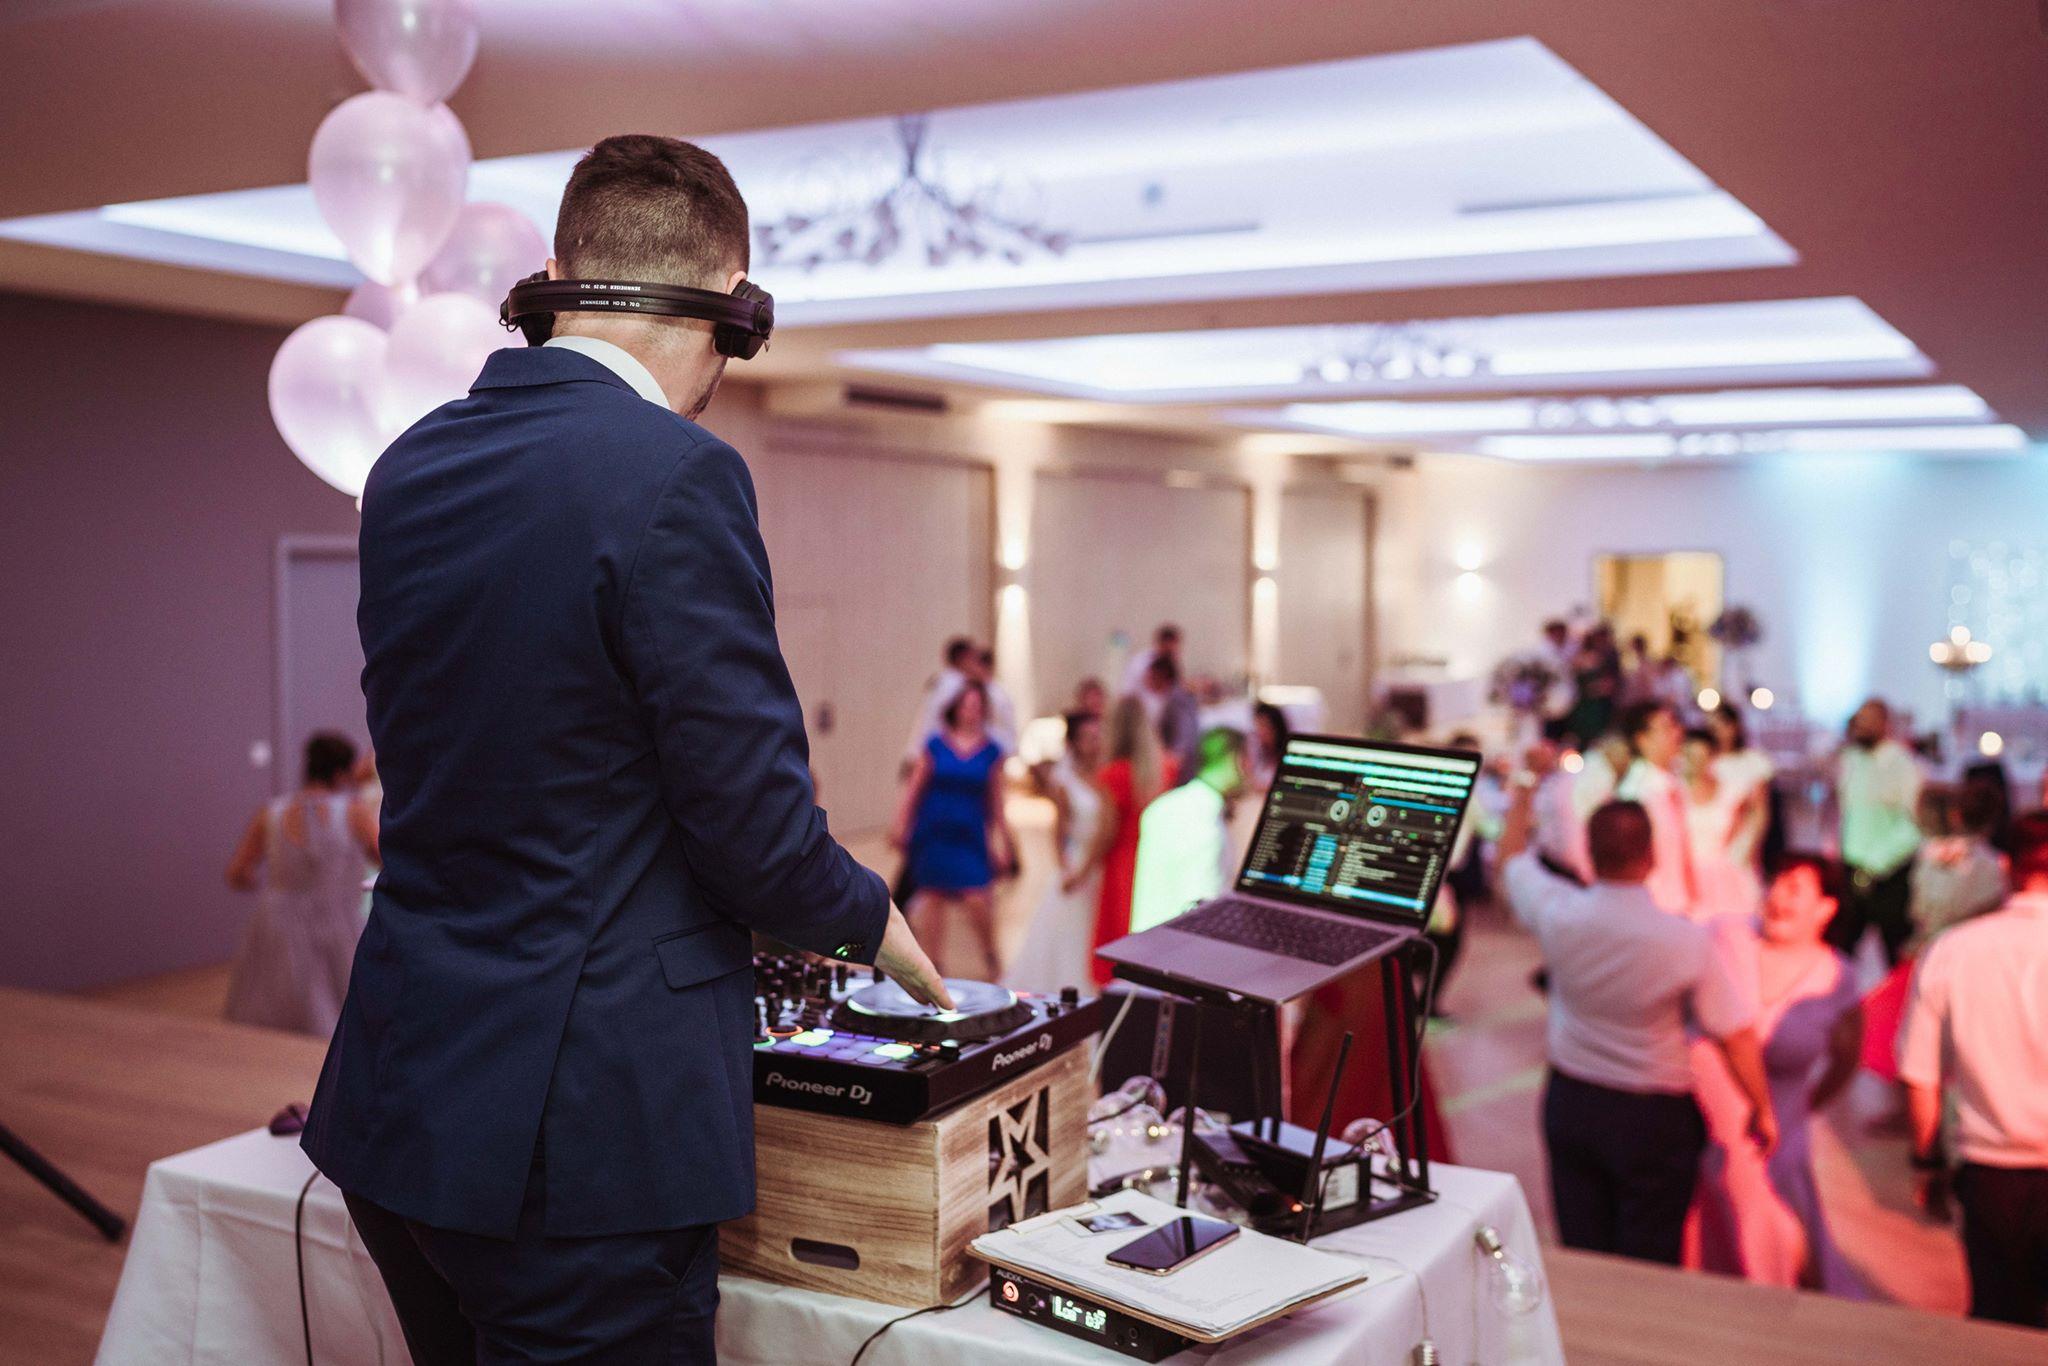 svadba-starejsi-moderator-dj-zilina-bratislava-kosice-poprad-skusenosti-referenciejpg